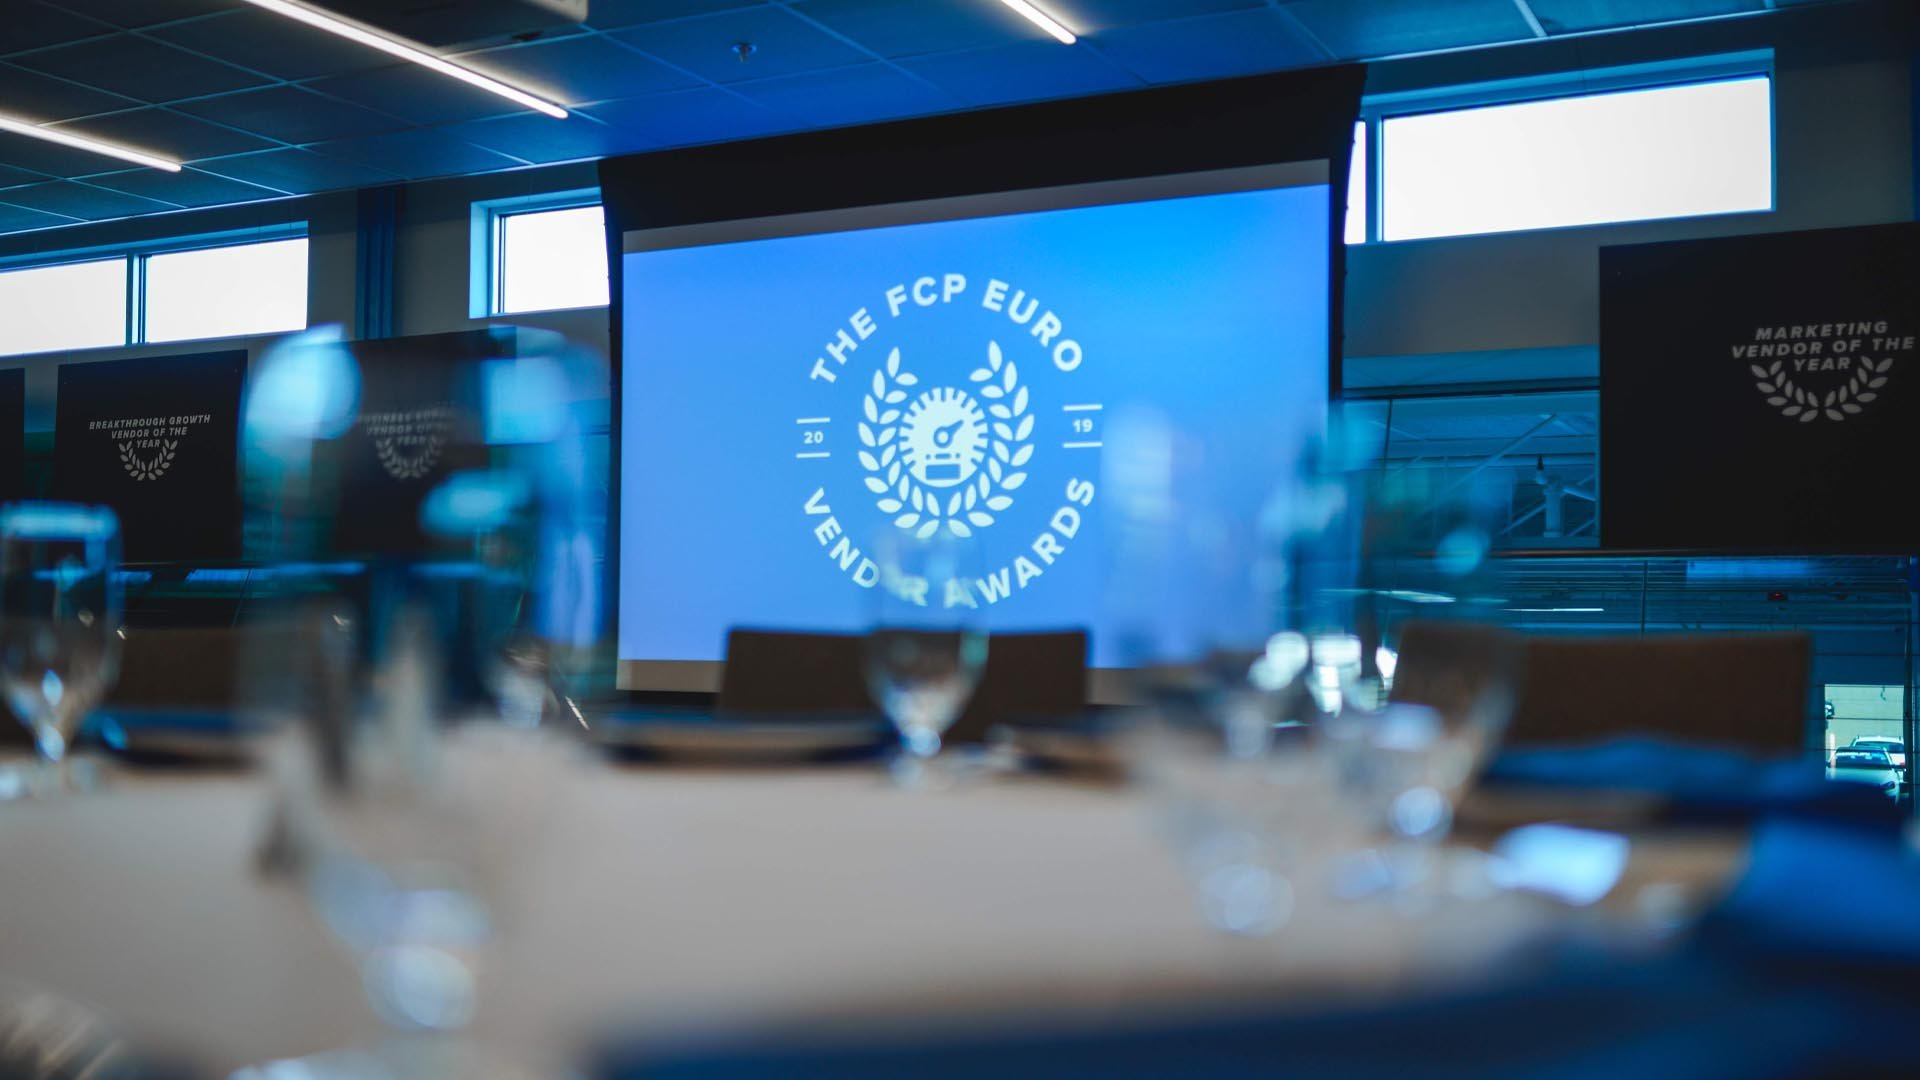 The 2019 FCP Euro Vendor Awards